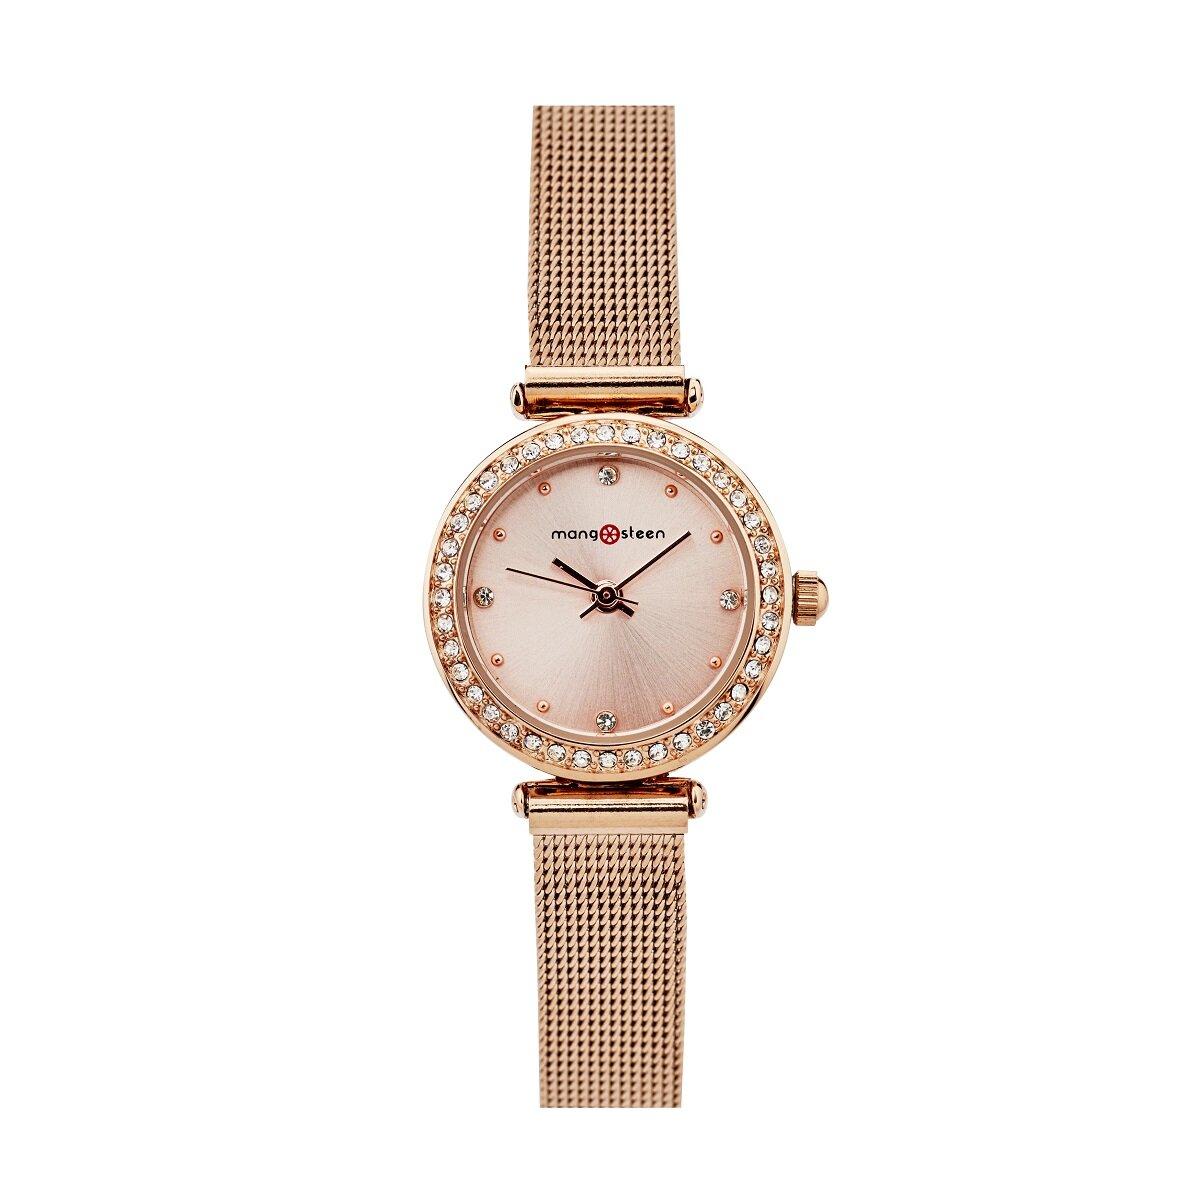 Đồng hồ nữ Mangosteen MS513F